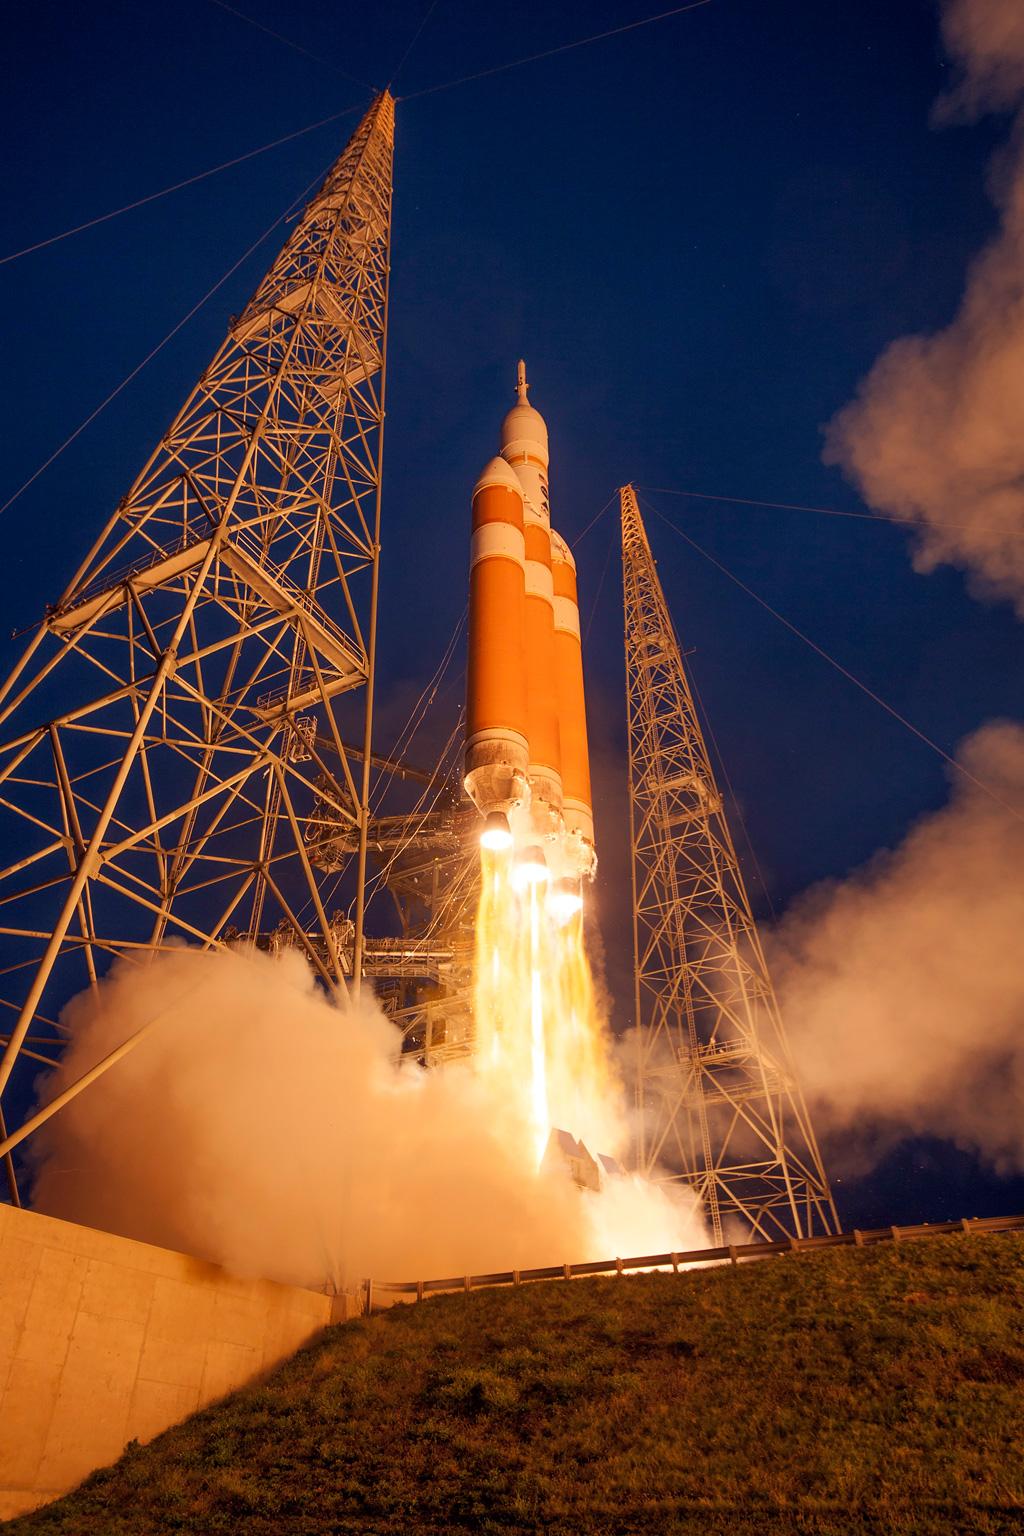 nasa orion launch hq high res photos (9)